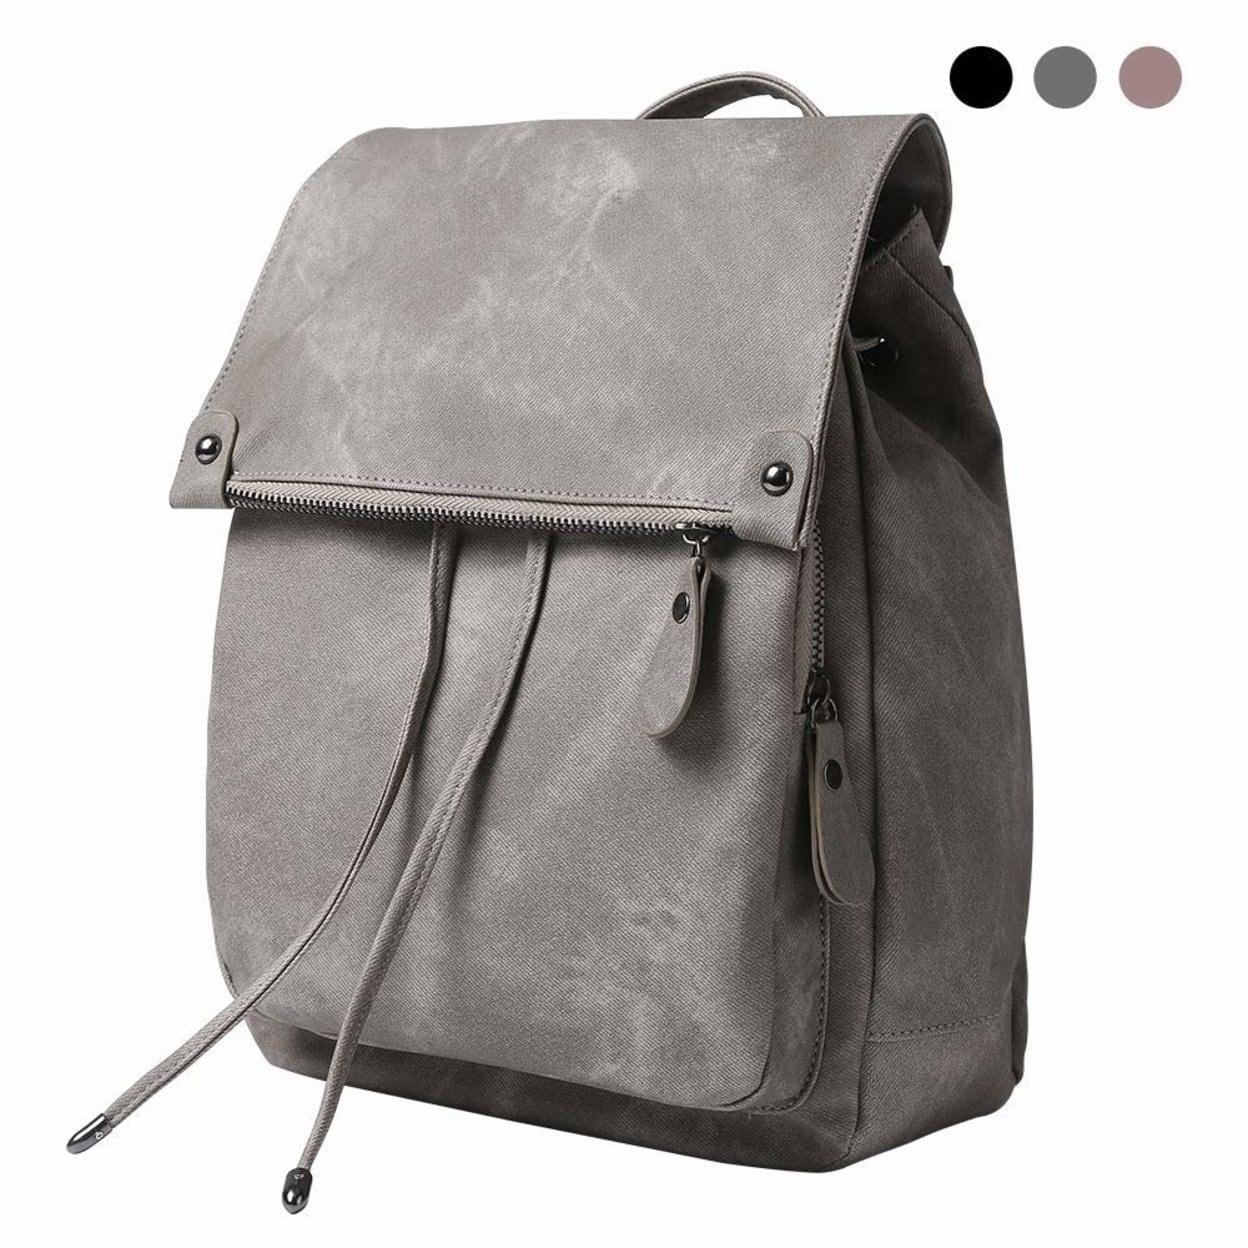 deabc0c37a77 Women Backpack Waterproof Anti-theft Lightweight PU Leather Nylon School  Shoulder Bag Travel Backpack Girls Ladies